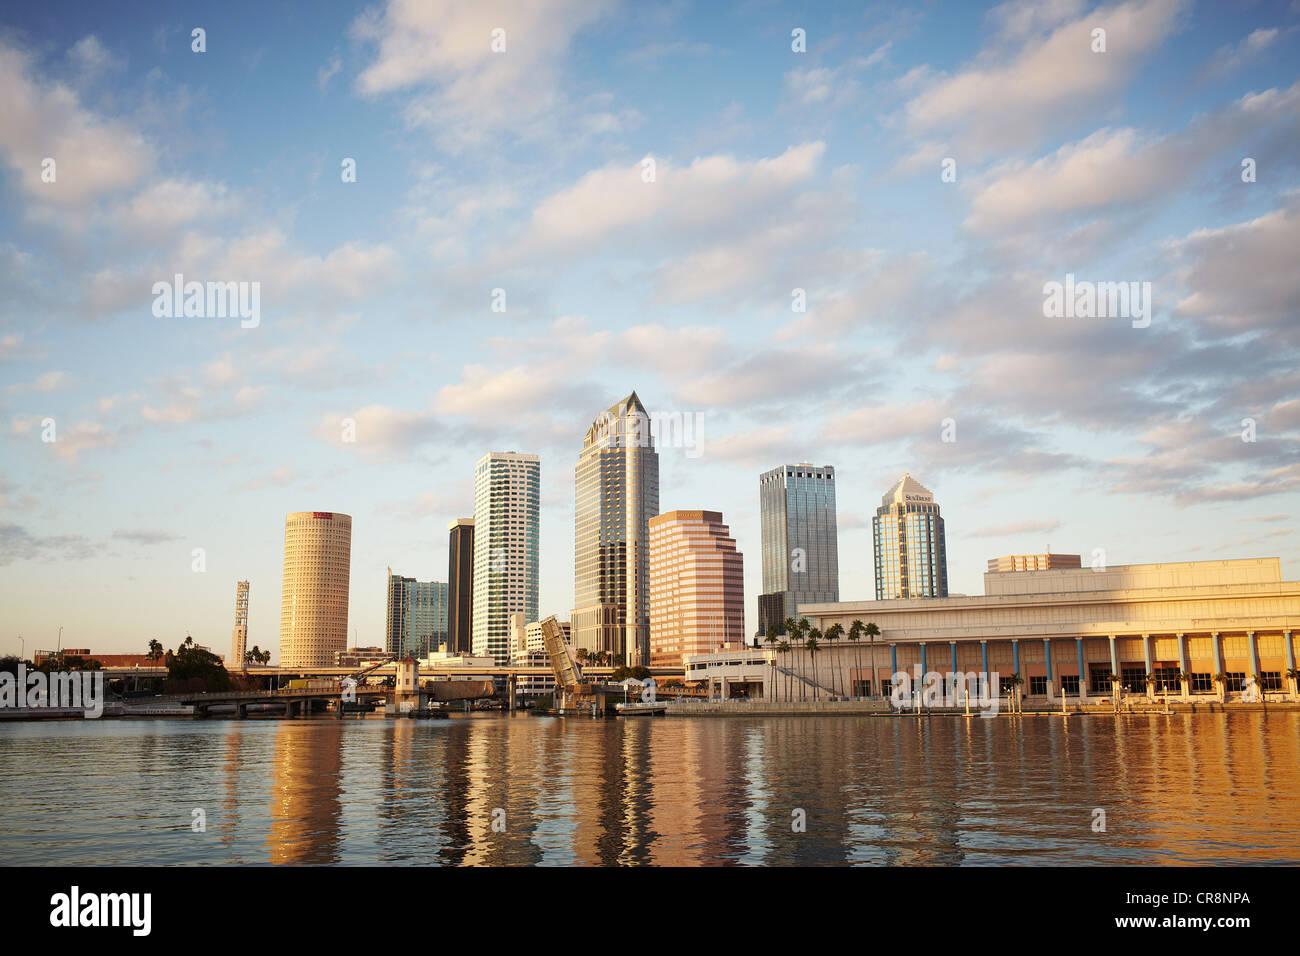 Skyline, Tampa, Florida, Stati Uniti d'America Immagini Stock